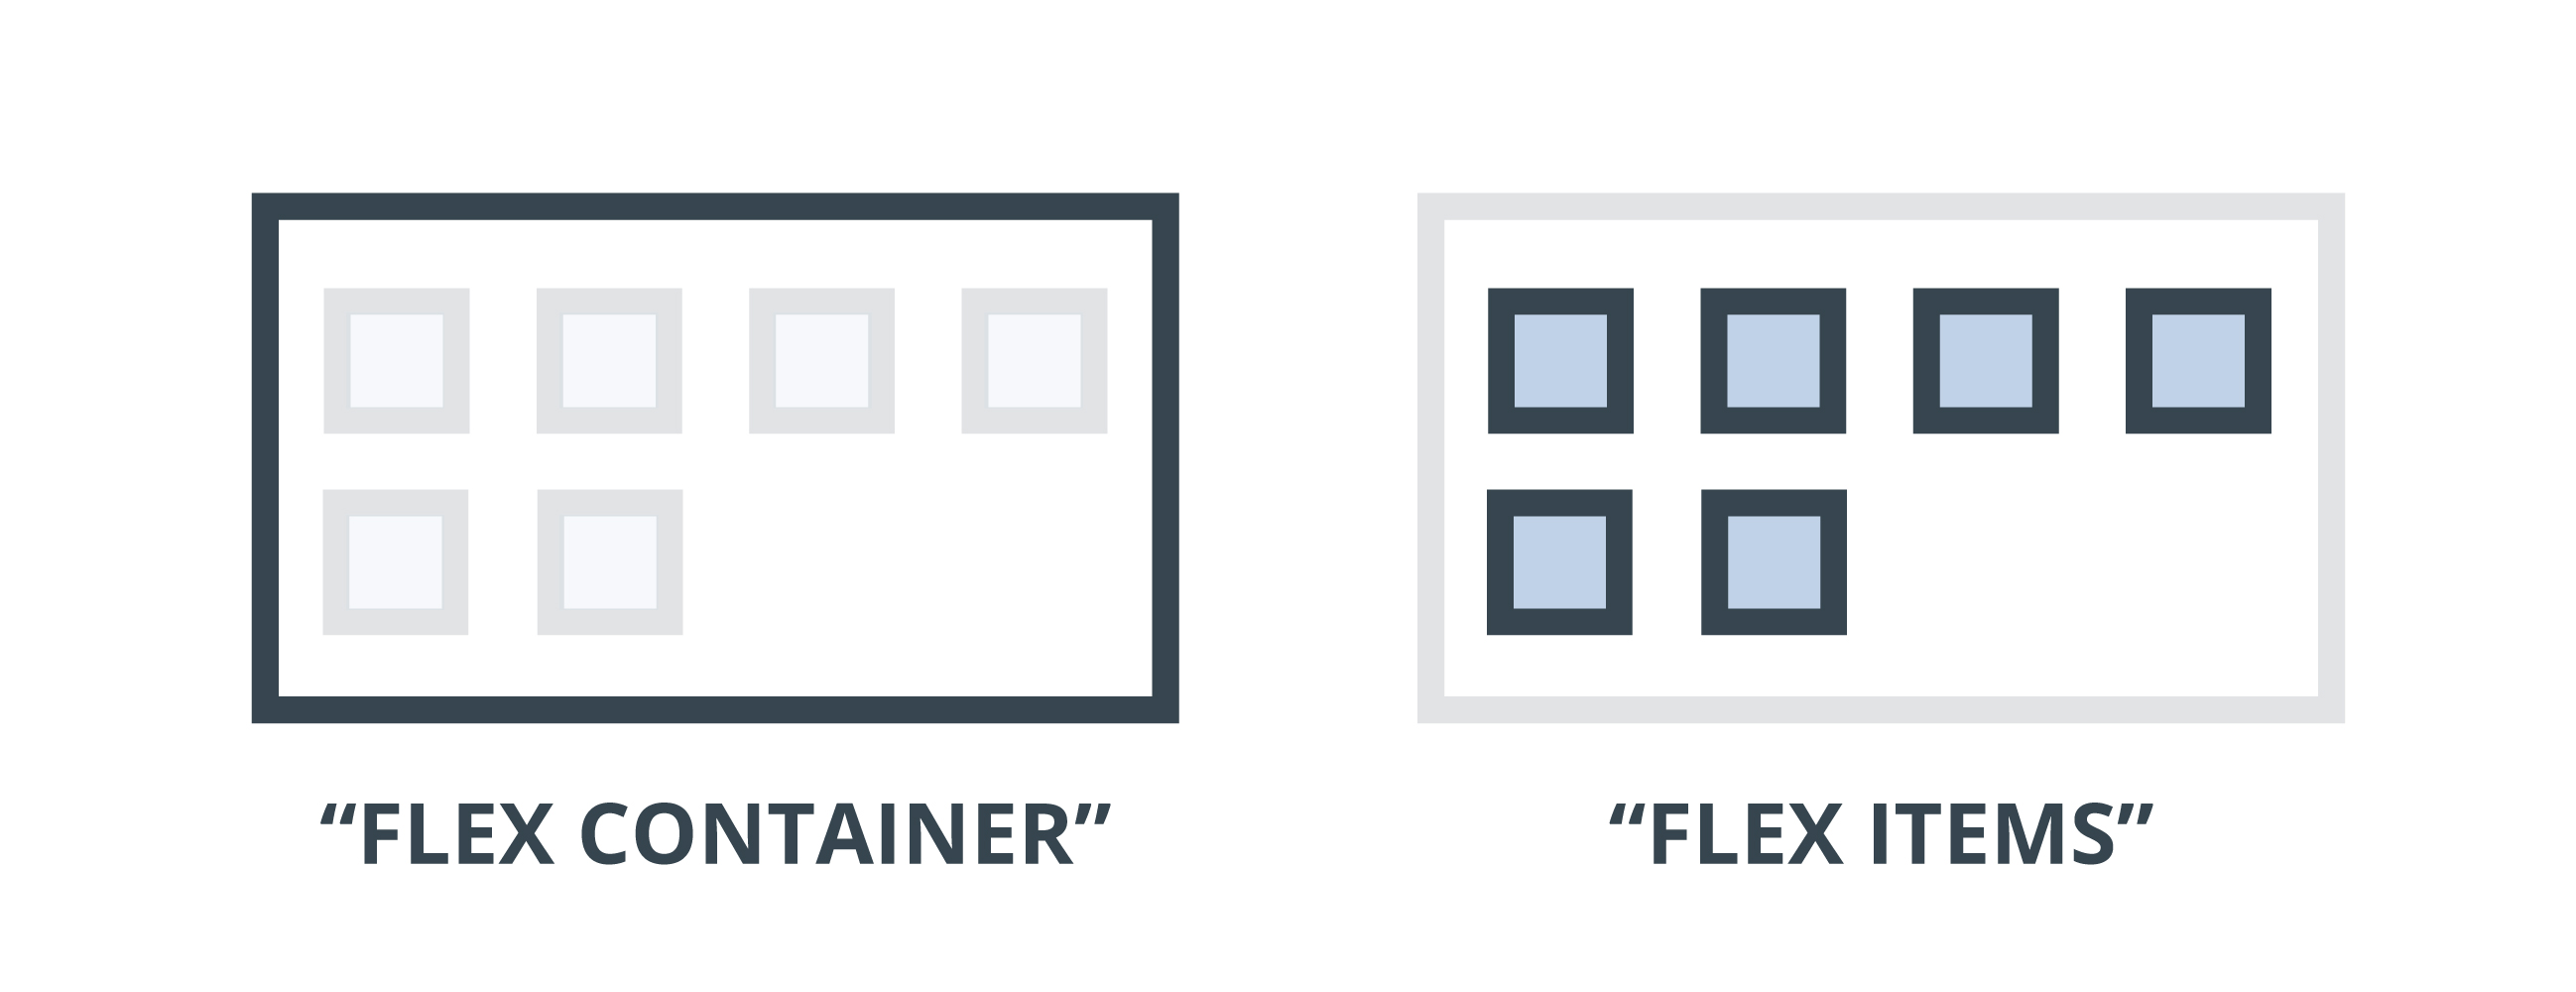 Css flexbox container vs items